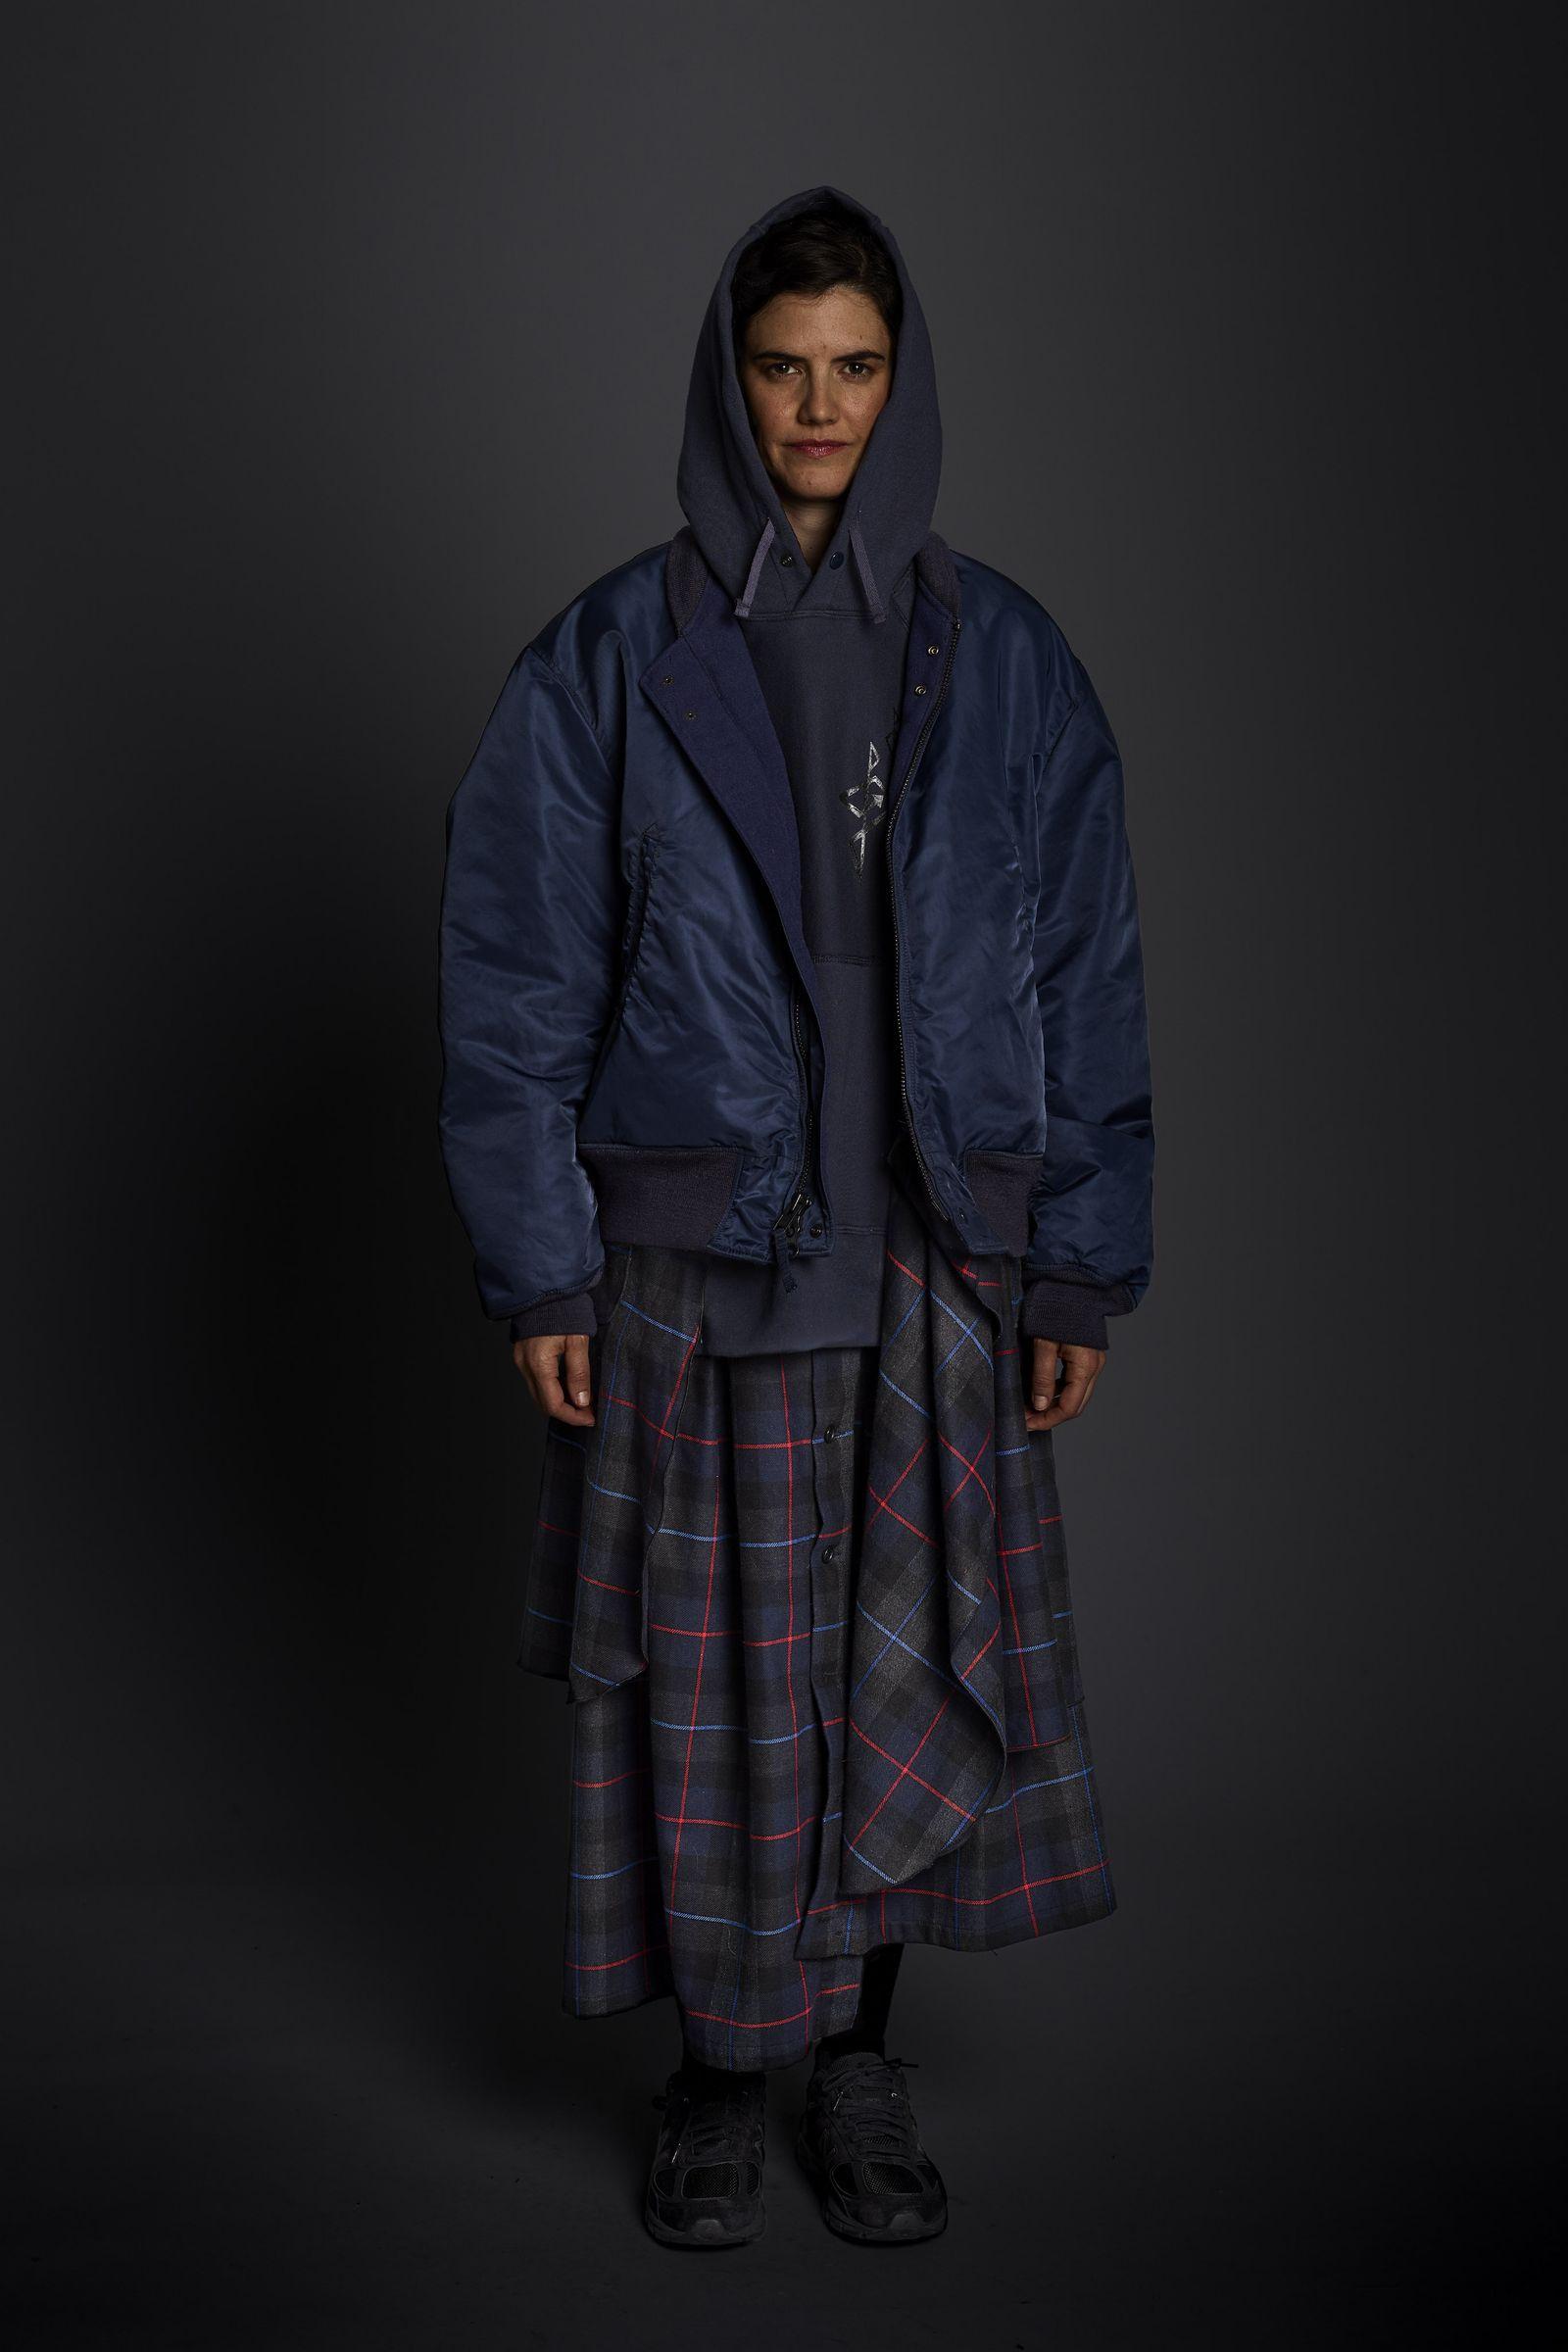 engineered-garments-fall-winter-2020-12